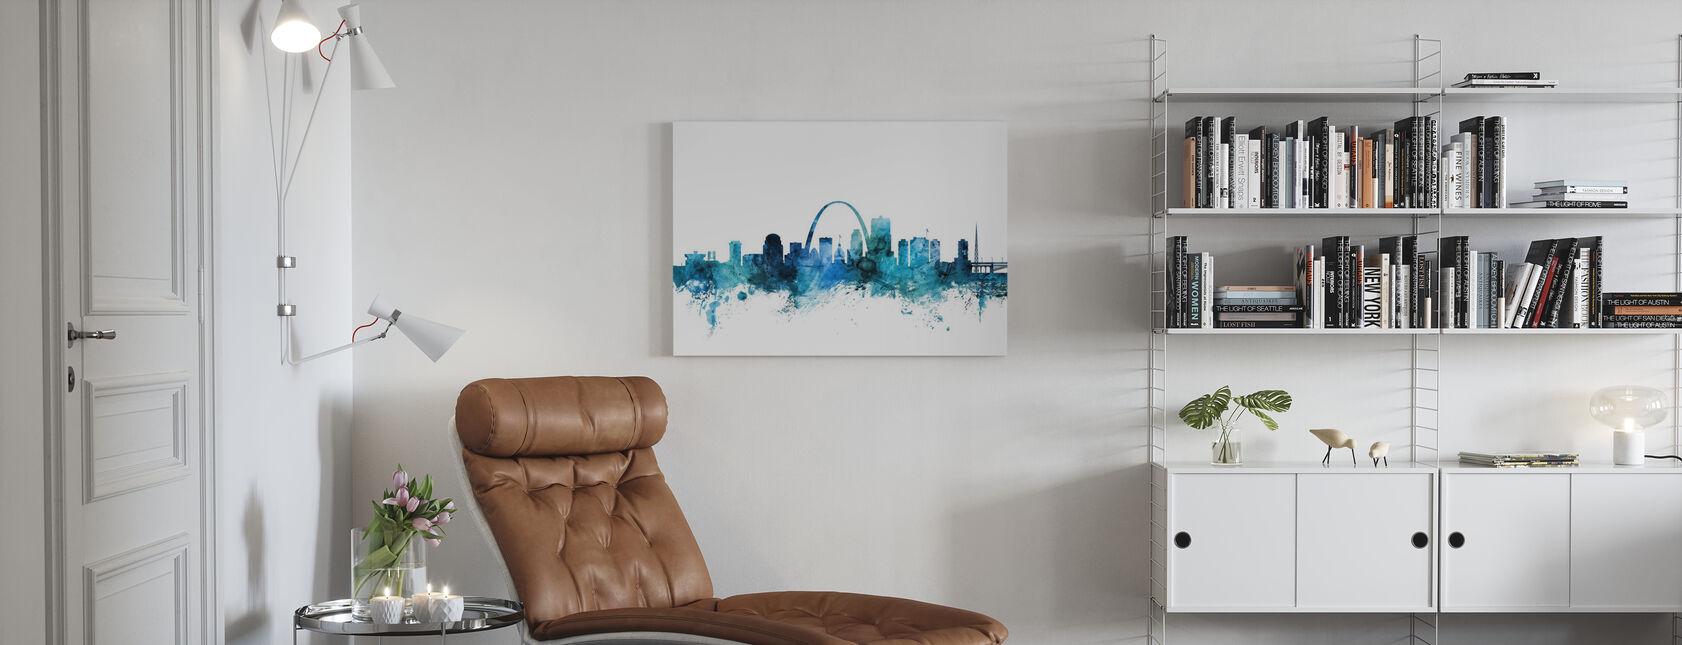 St Louis Missouri Skyline - Canvas print - Living Room